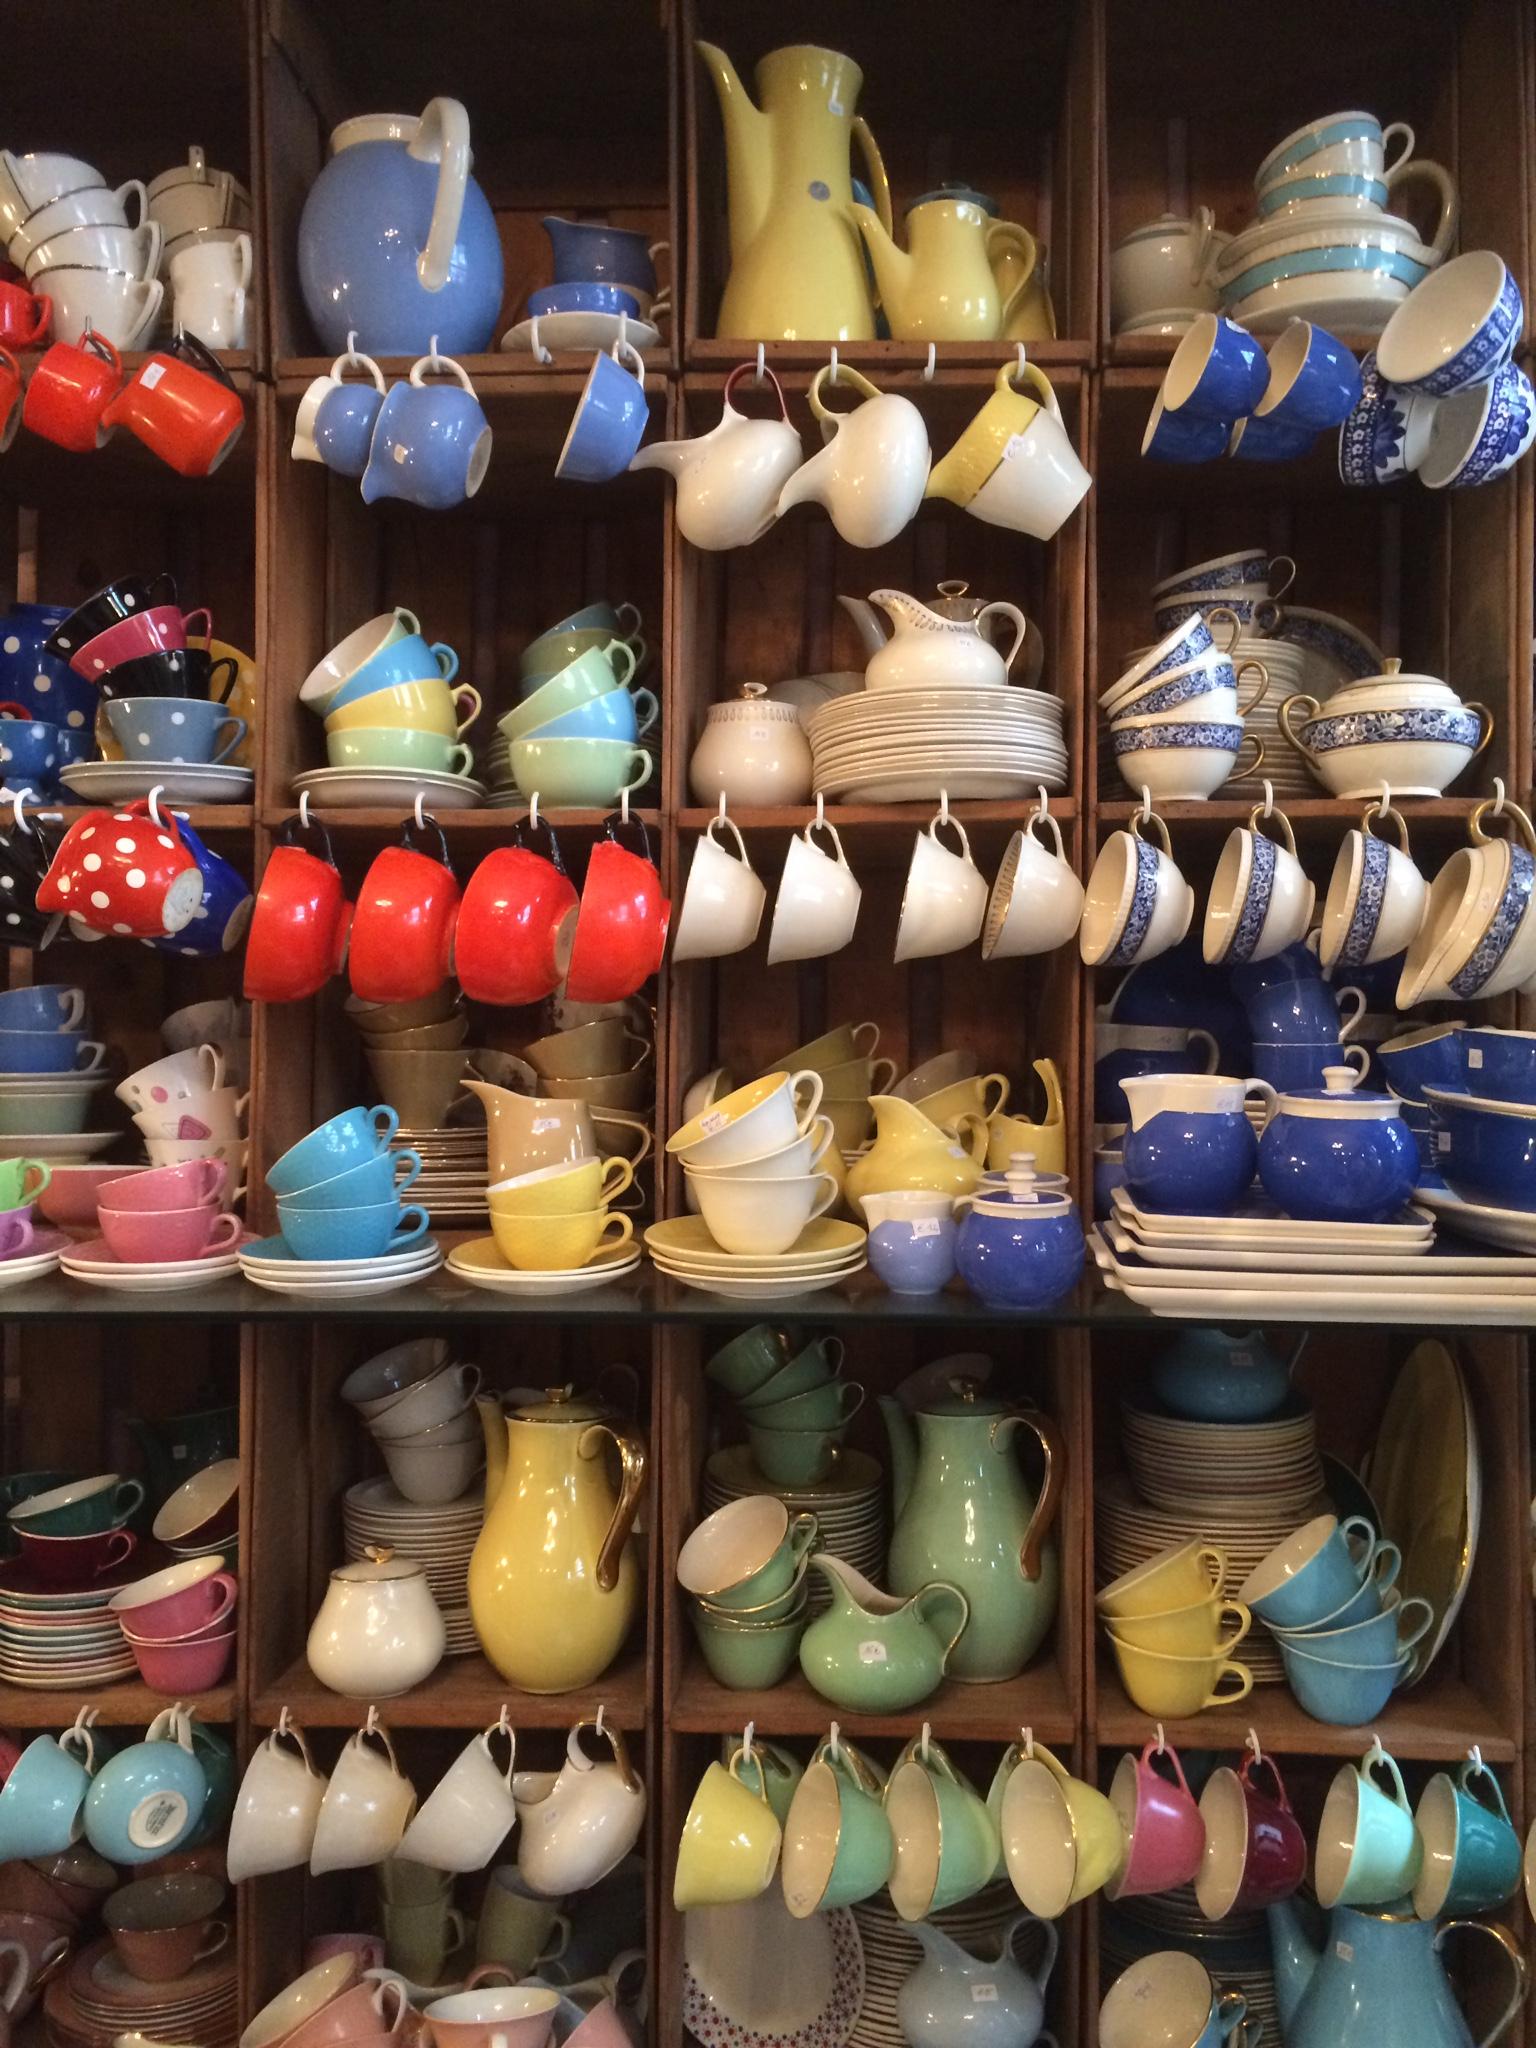 burkelbloem gent clouds9000 vintage ceramics boch